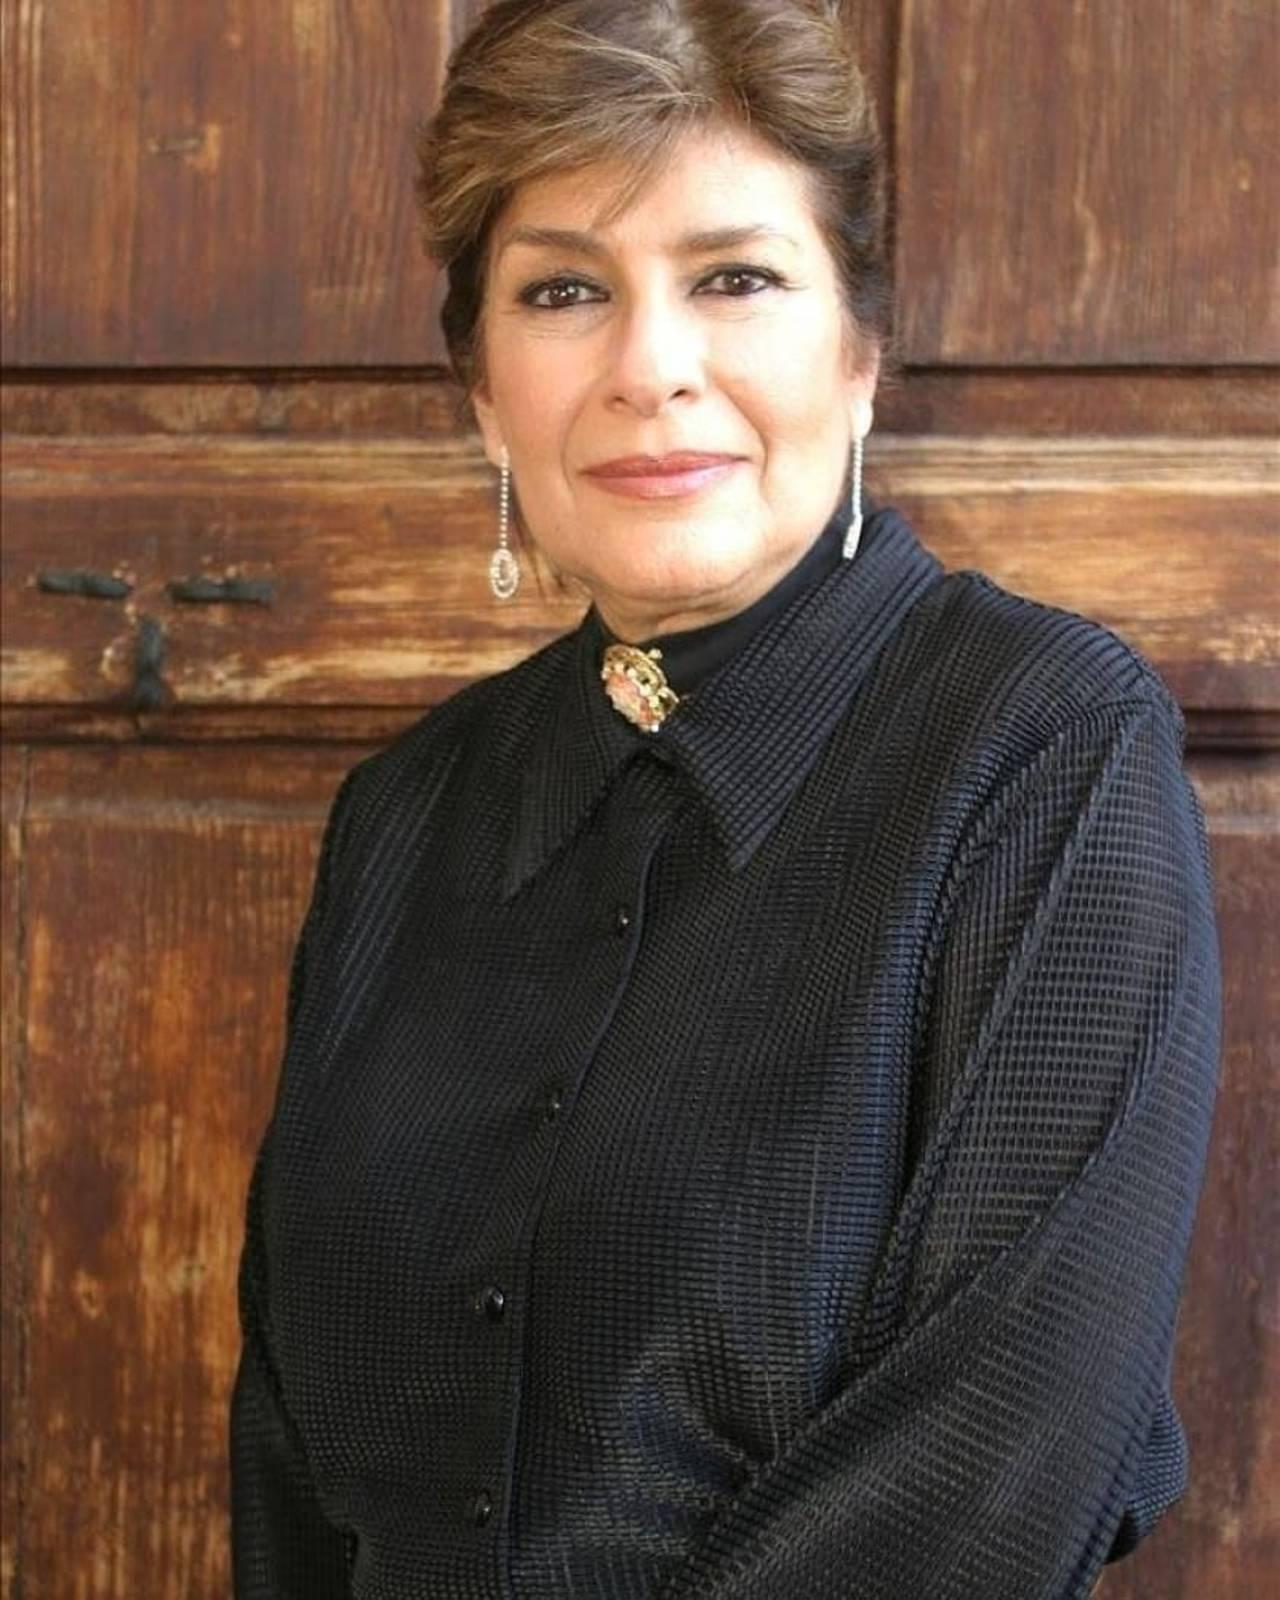 Actriz Raquel Olmedo hospitalizada Covid-19 intubada